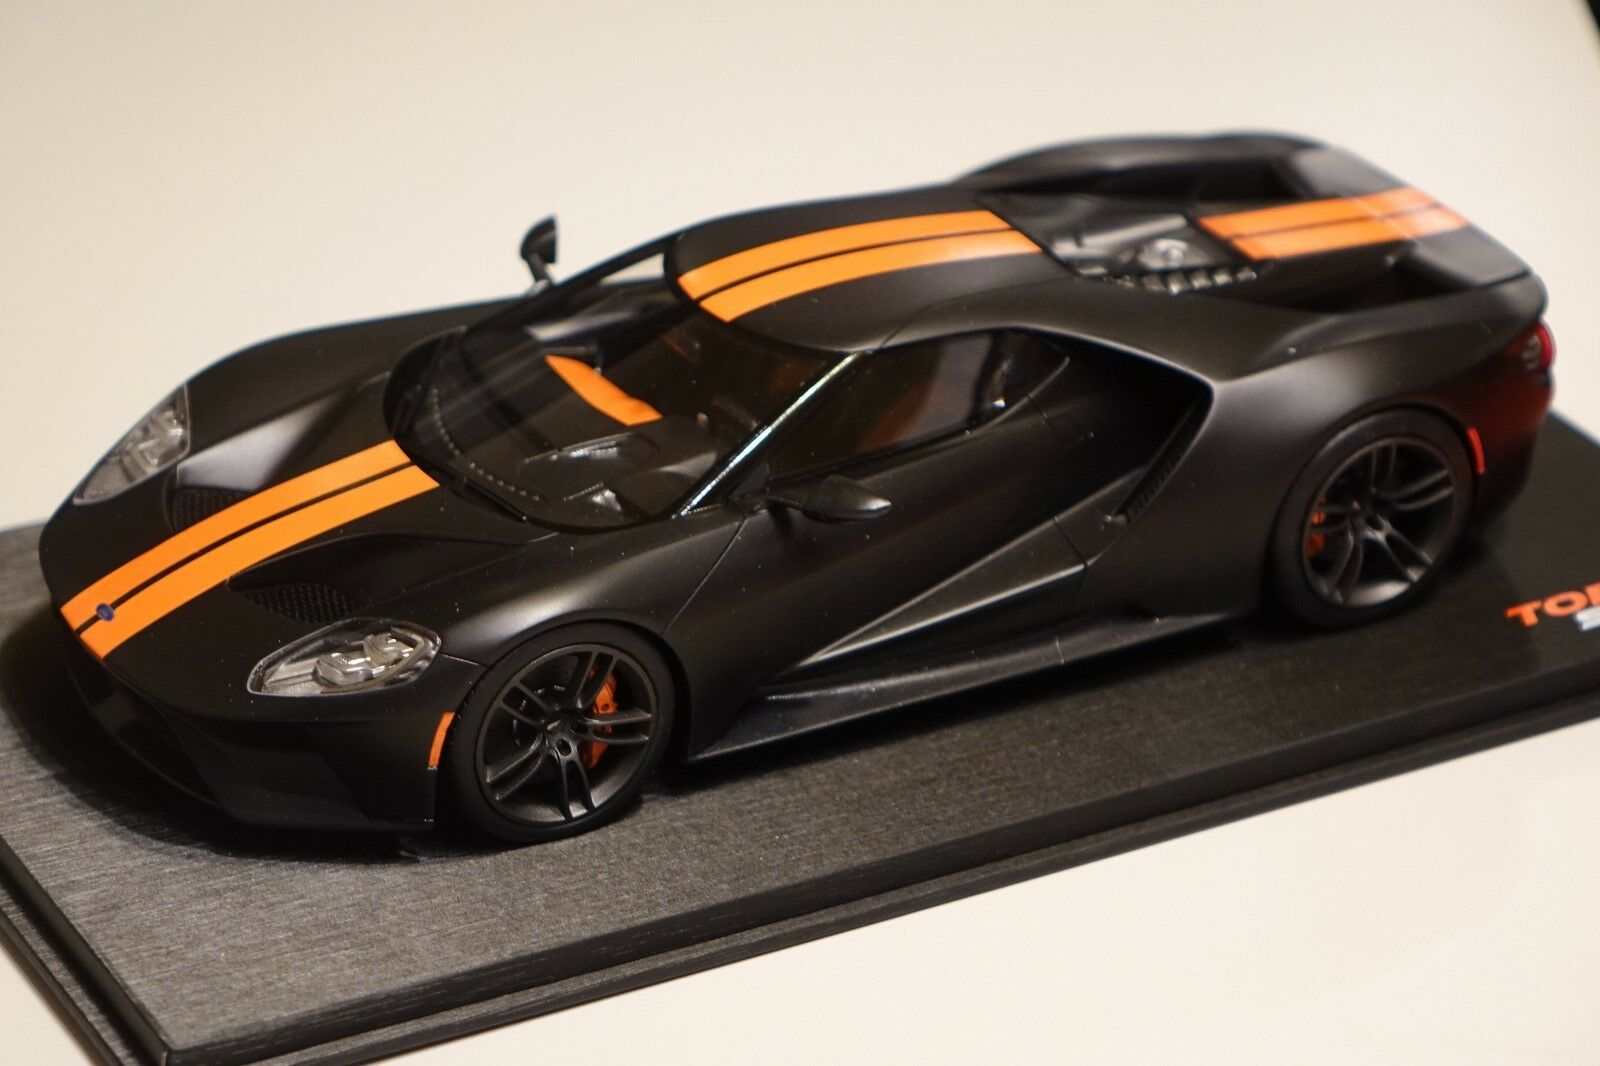 2015 Of Gt Noir 999 Speed Mat Ts0092 Ford Orange Nouveauamp; Neuf 1 hxrdtsBoQC